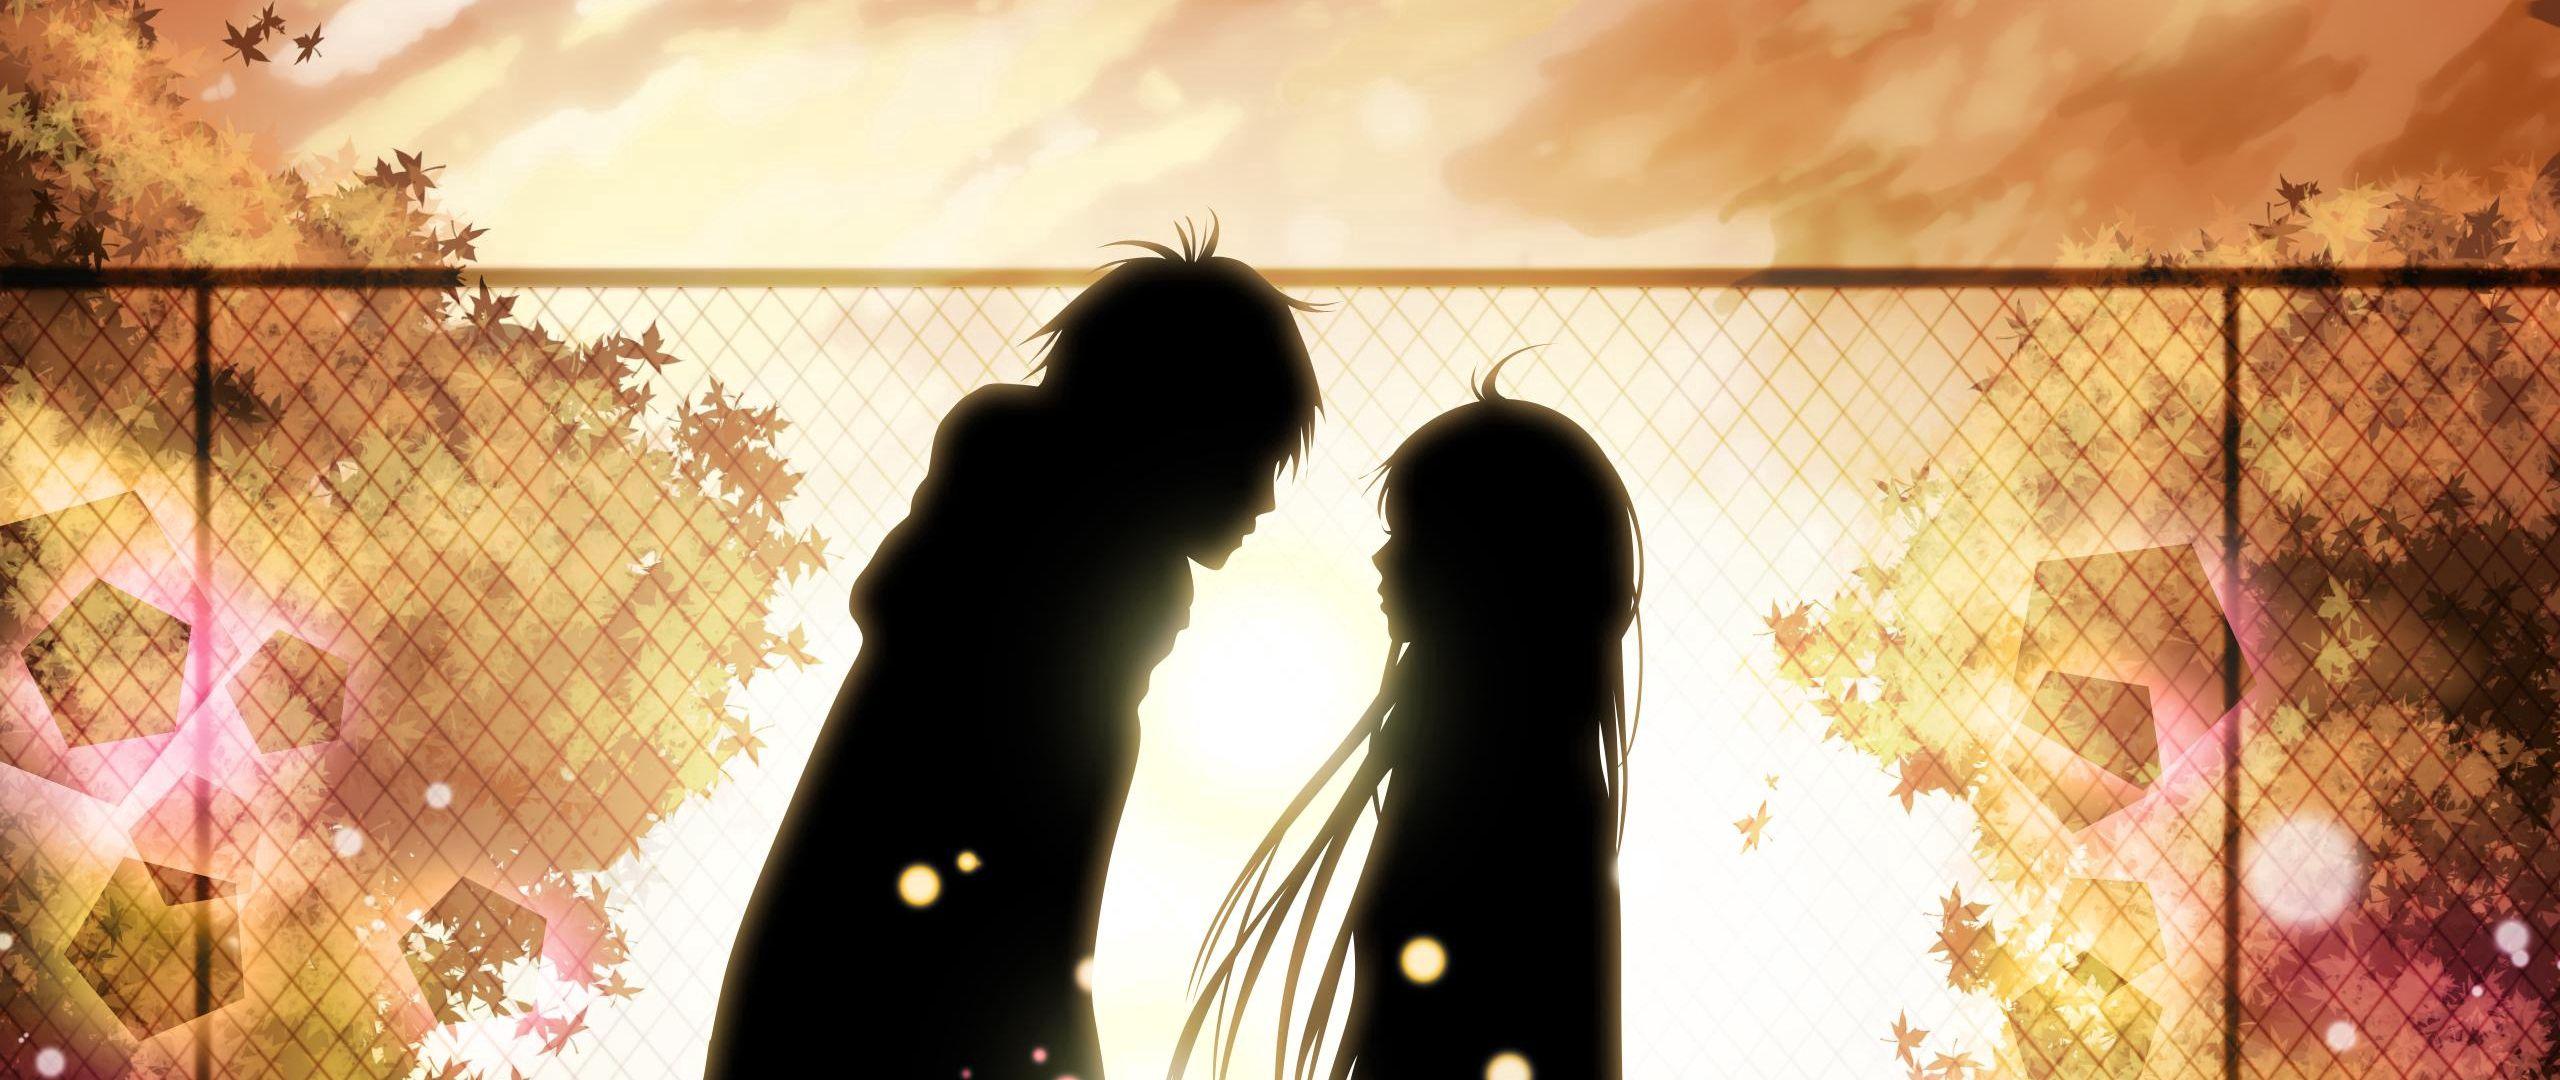 2560x1080 Wallpaper kimi ni todoke, girl, boy, love, feelings, meet, date, fall, leaves